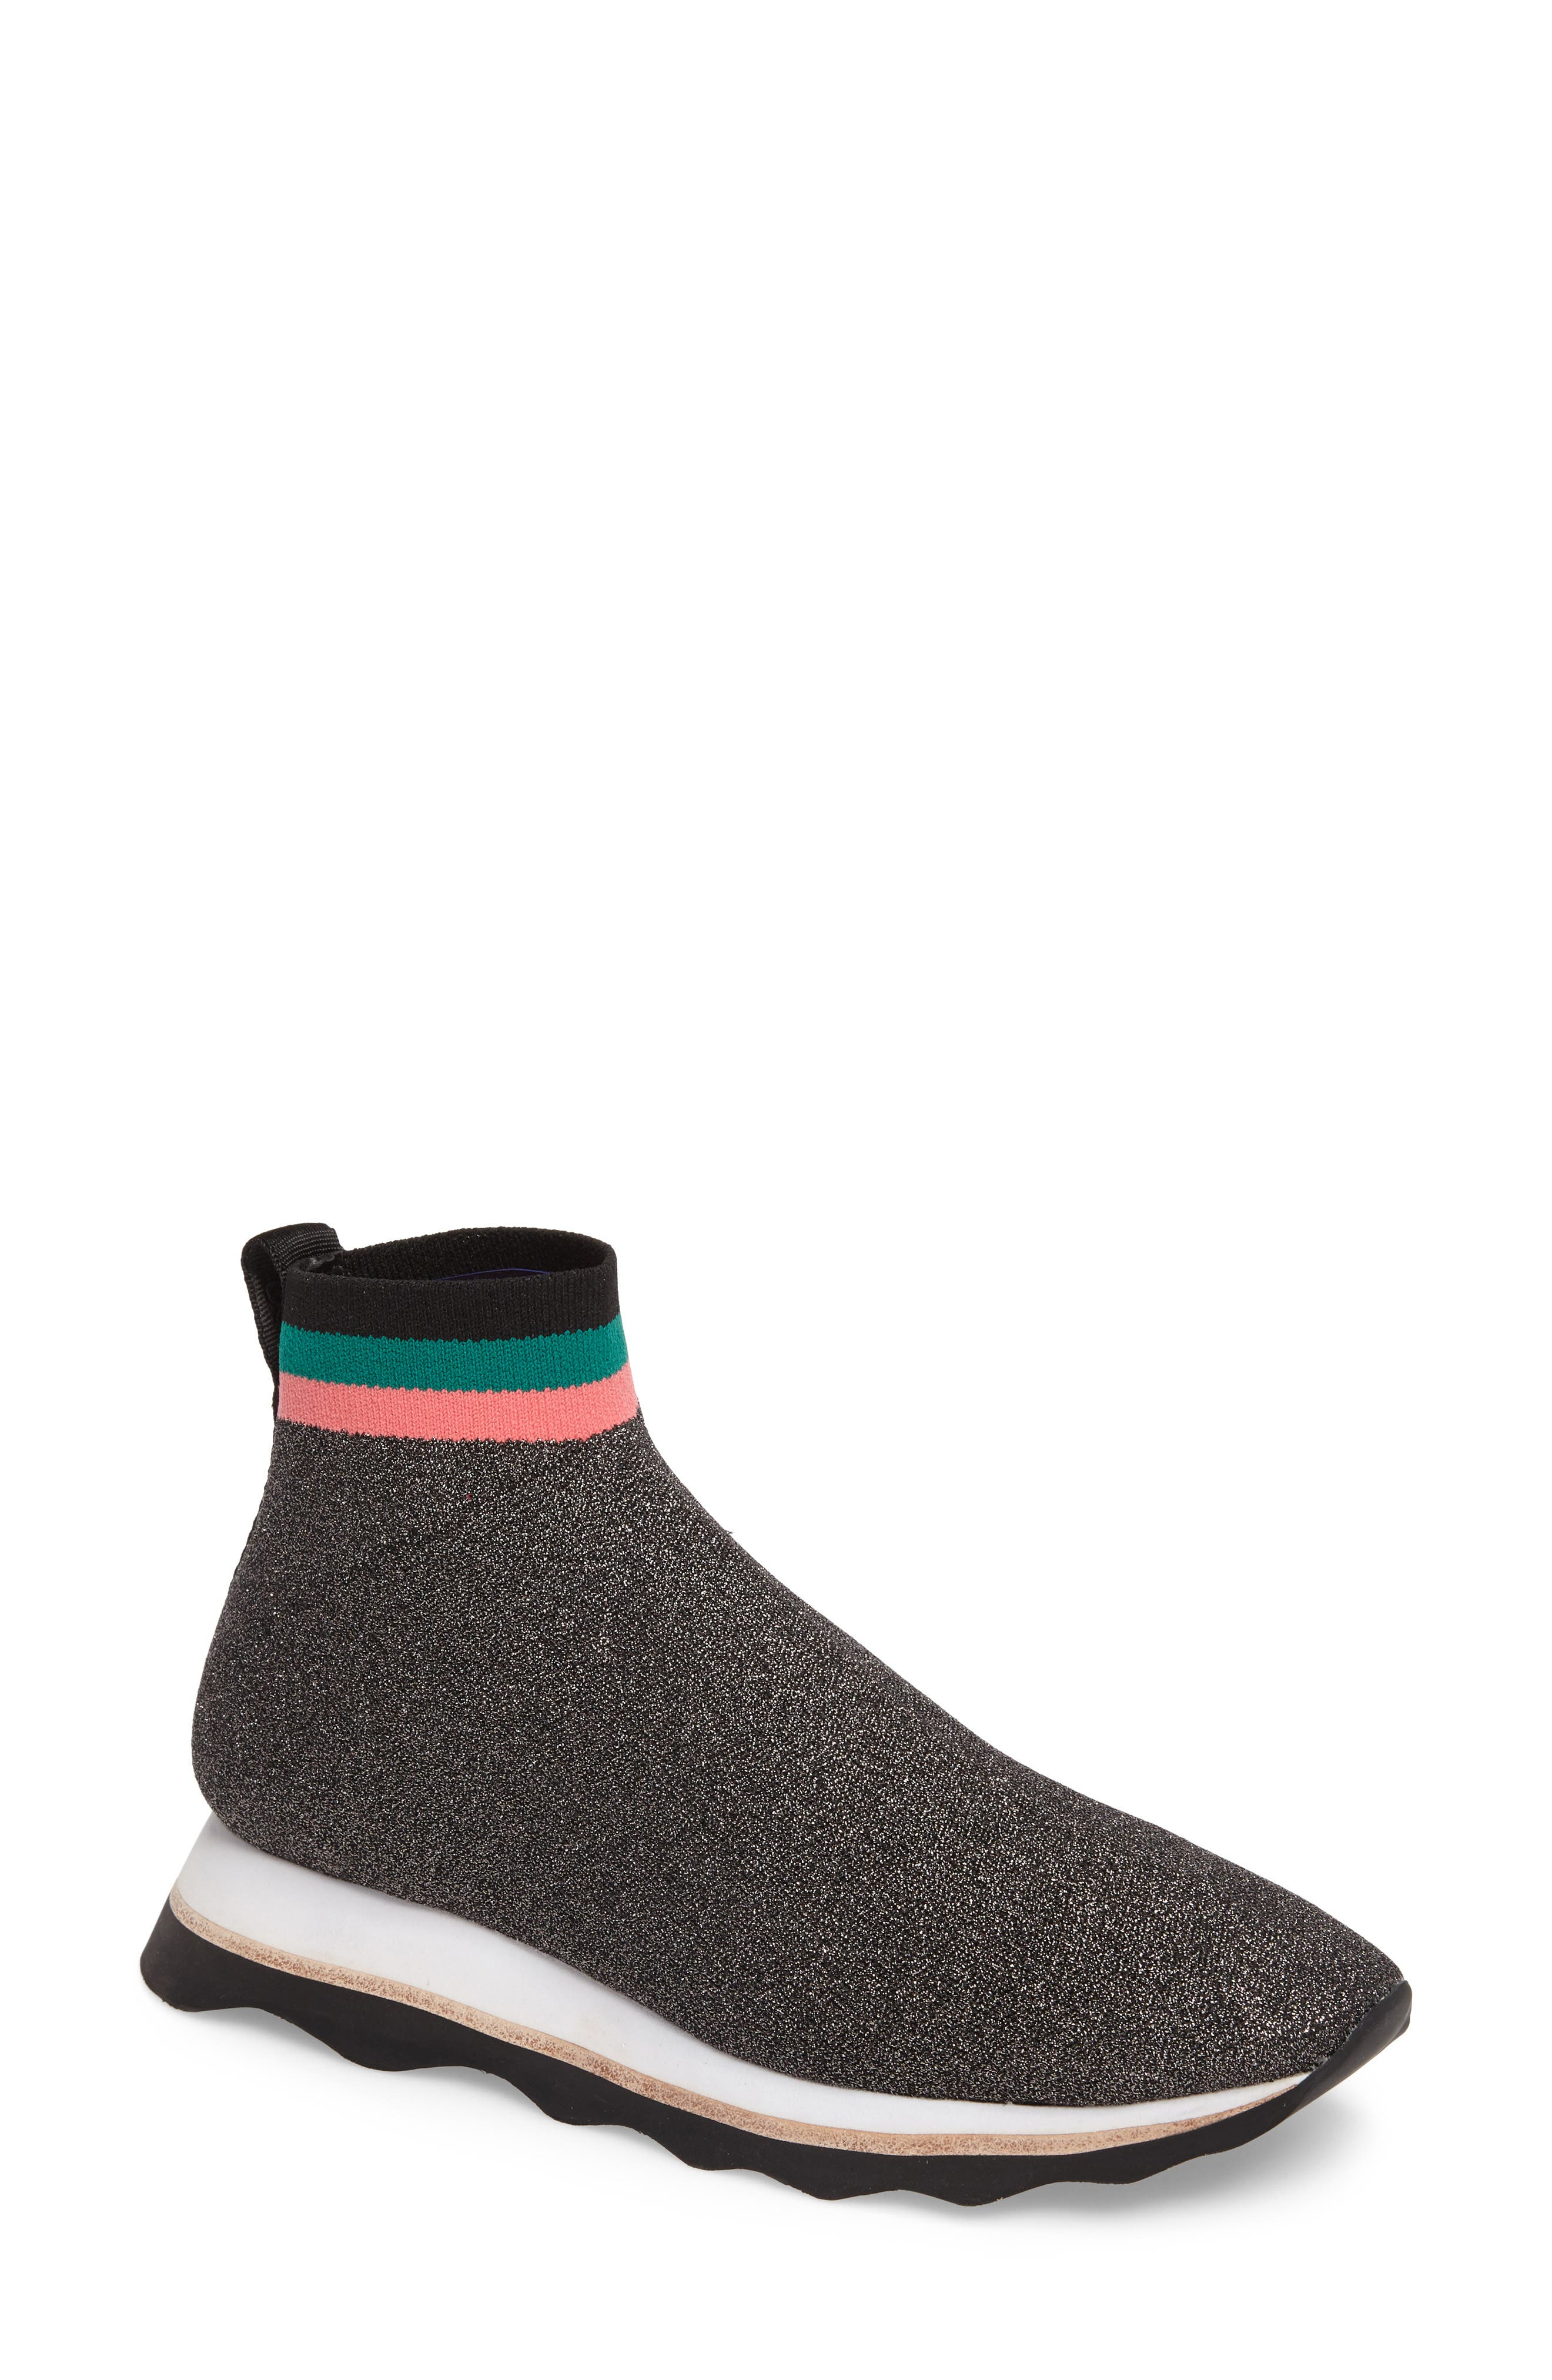 Alternate Image 1 Selected - Loeffler Randall Scout Sock Sneaker (Women)